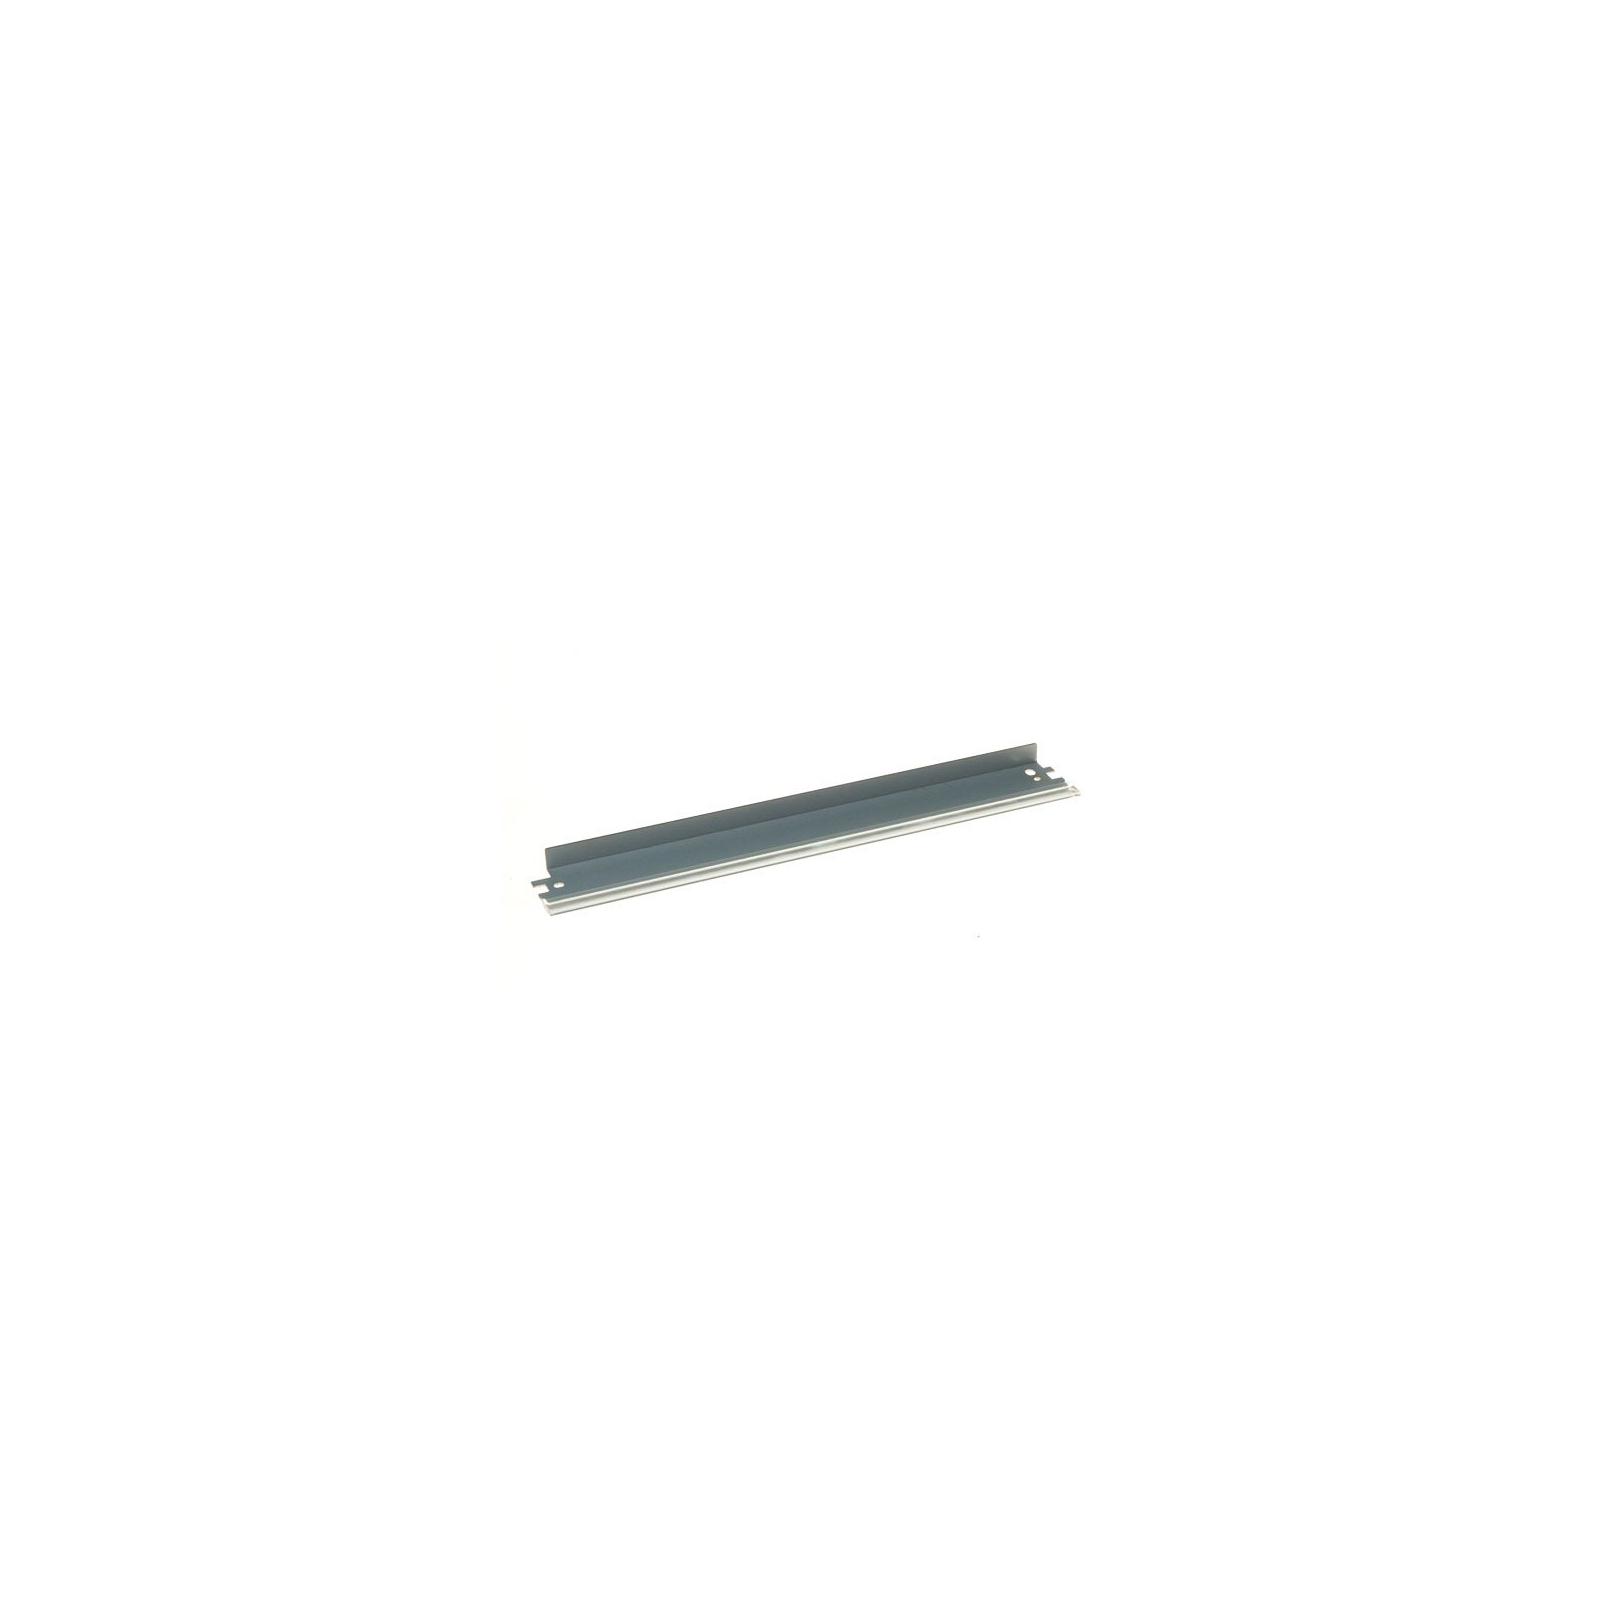 Чистящее лезвие EVERPRINT HP LJ 1000/1100/1200/1300 (WB-HP-1200-EVP)